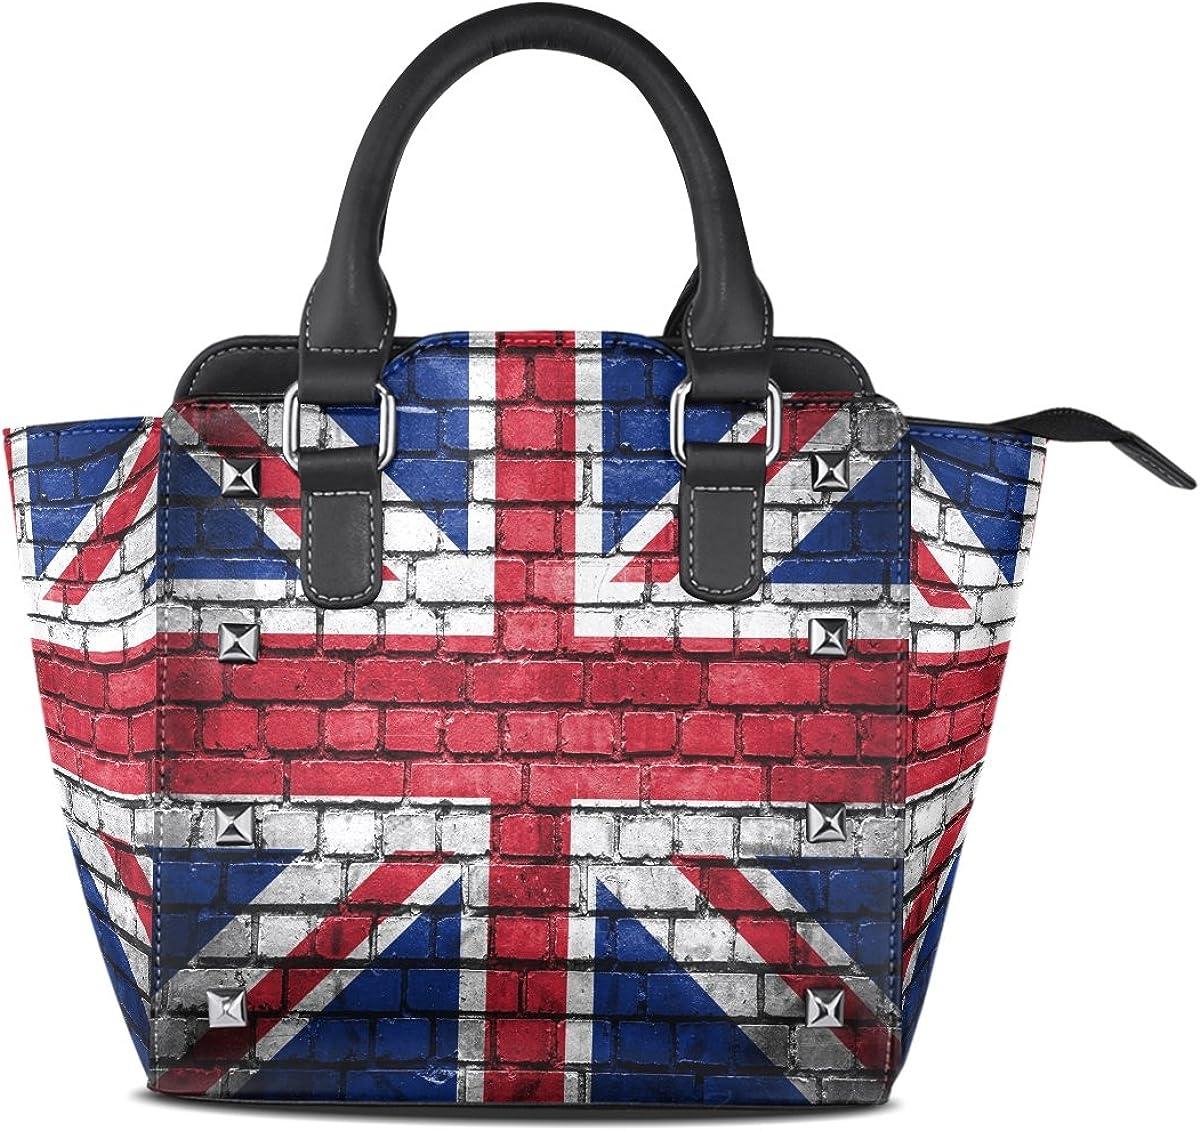 Use4 Brick Wall Union Jack Rivet PU Leather Tote Bag Shoulder Bag Purse